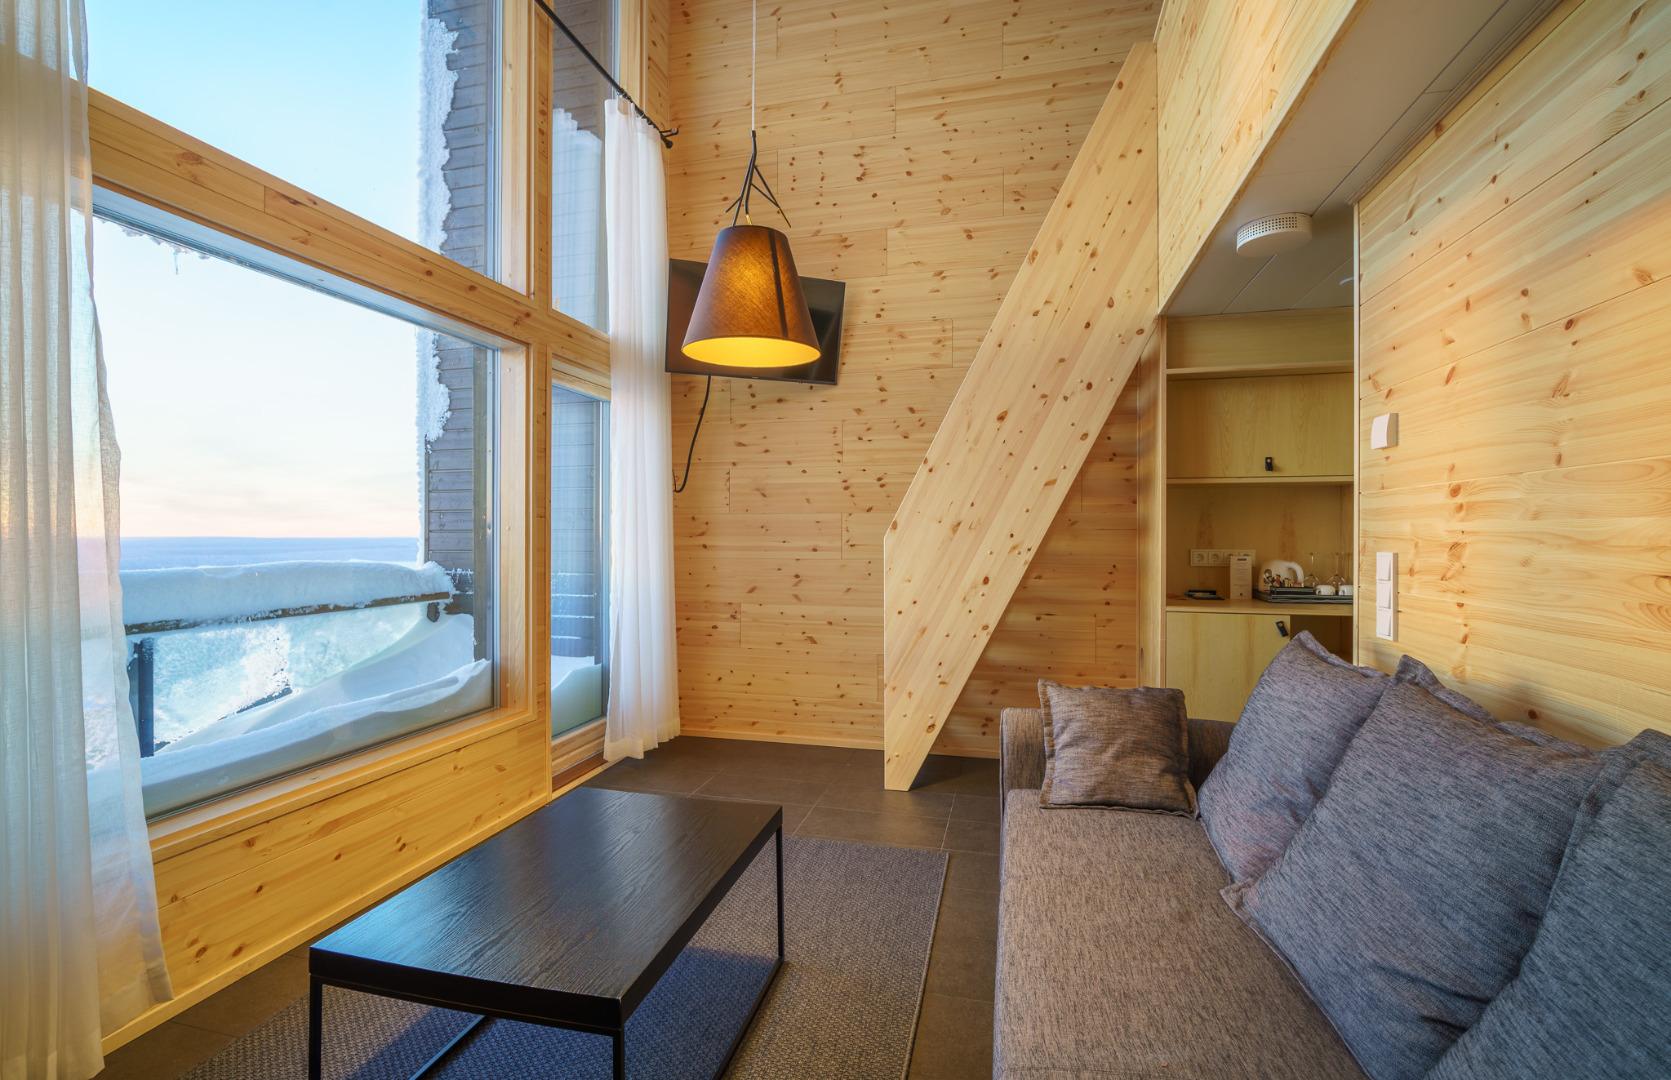 Santa's Star Arctic Hotel - Type A Suite